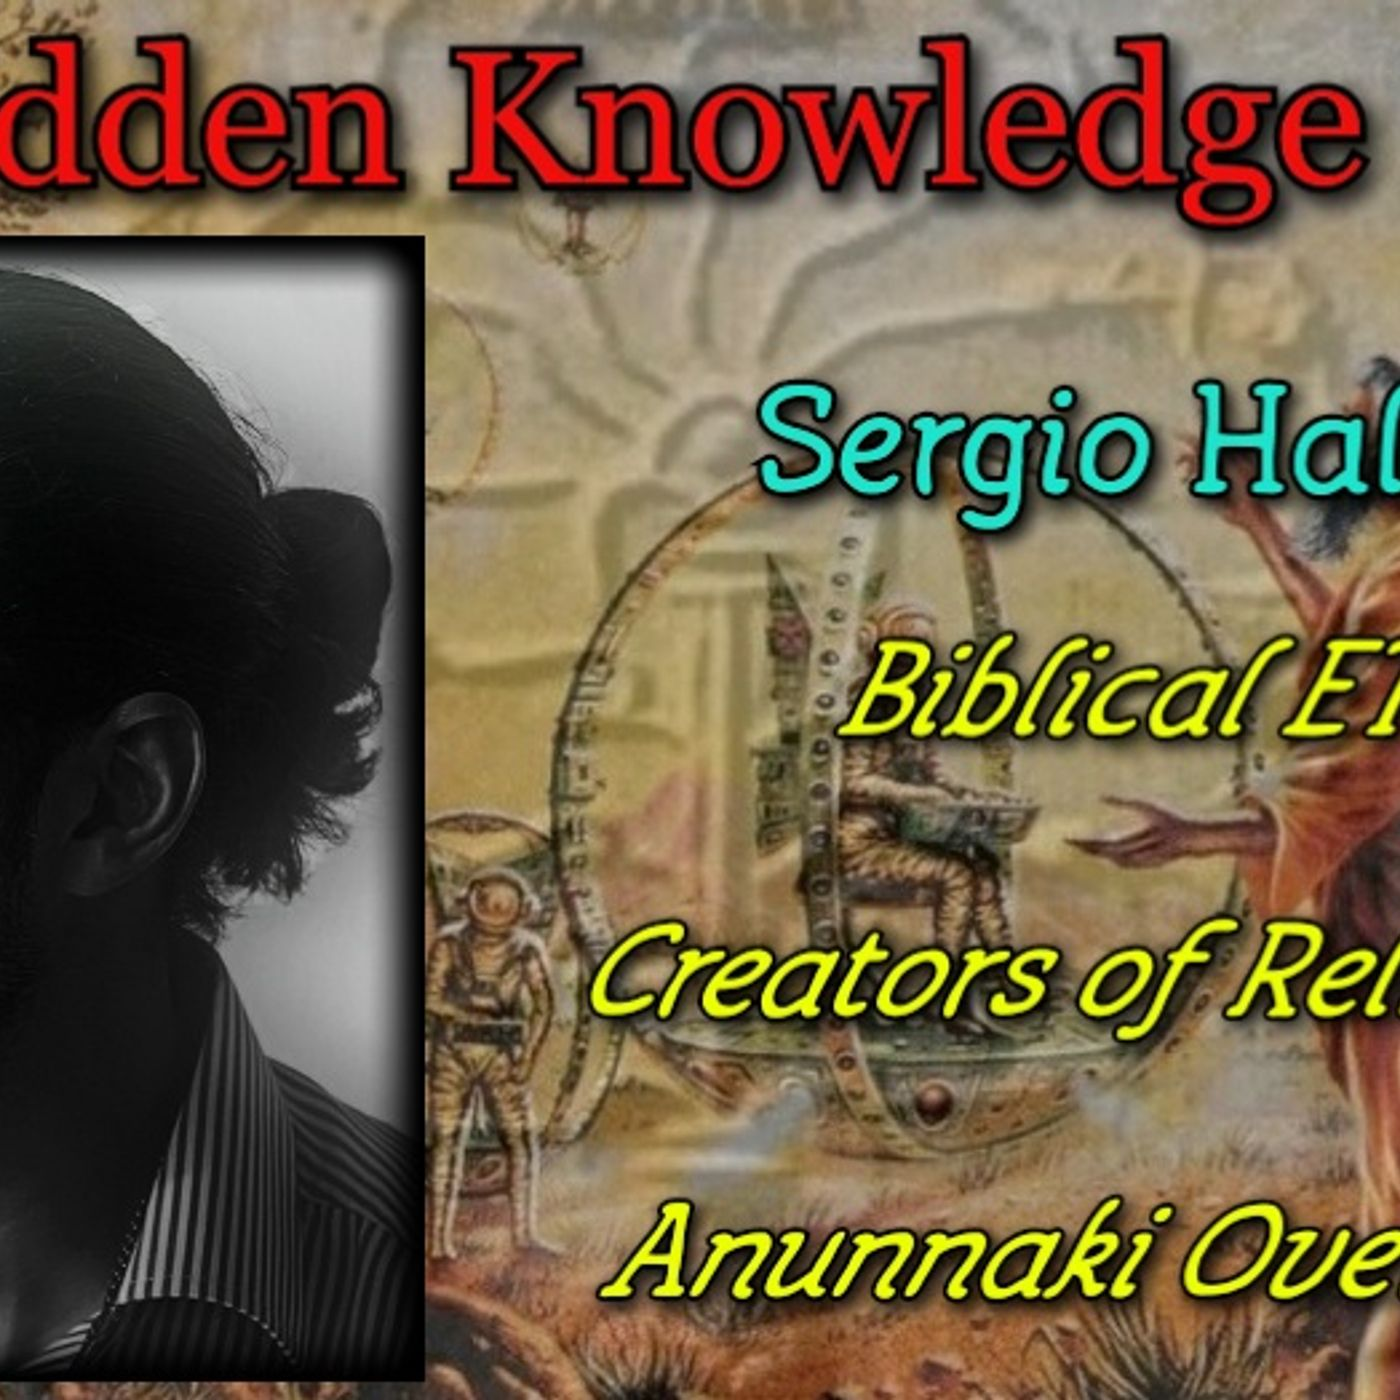 Biblical ETs - Creators of Religions - Anunnaki Overlords with Sergio Halabi